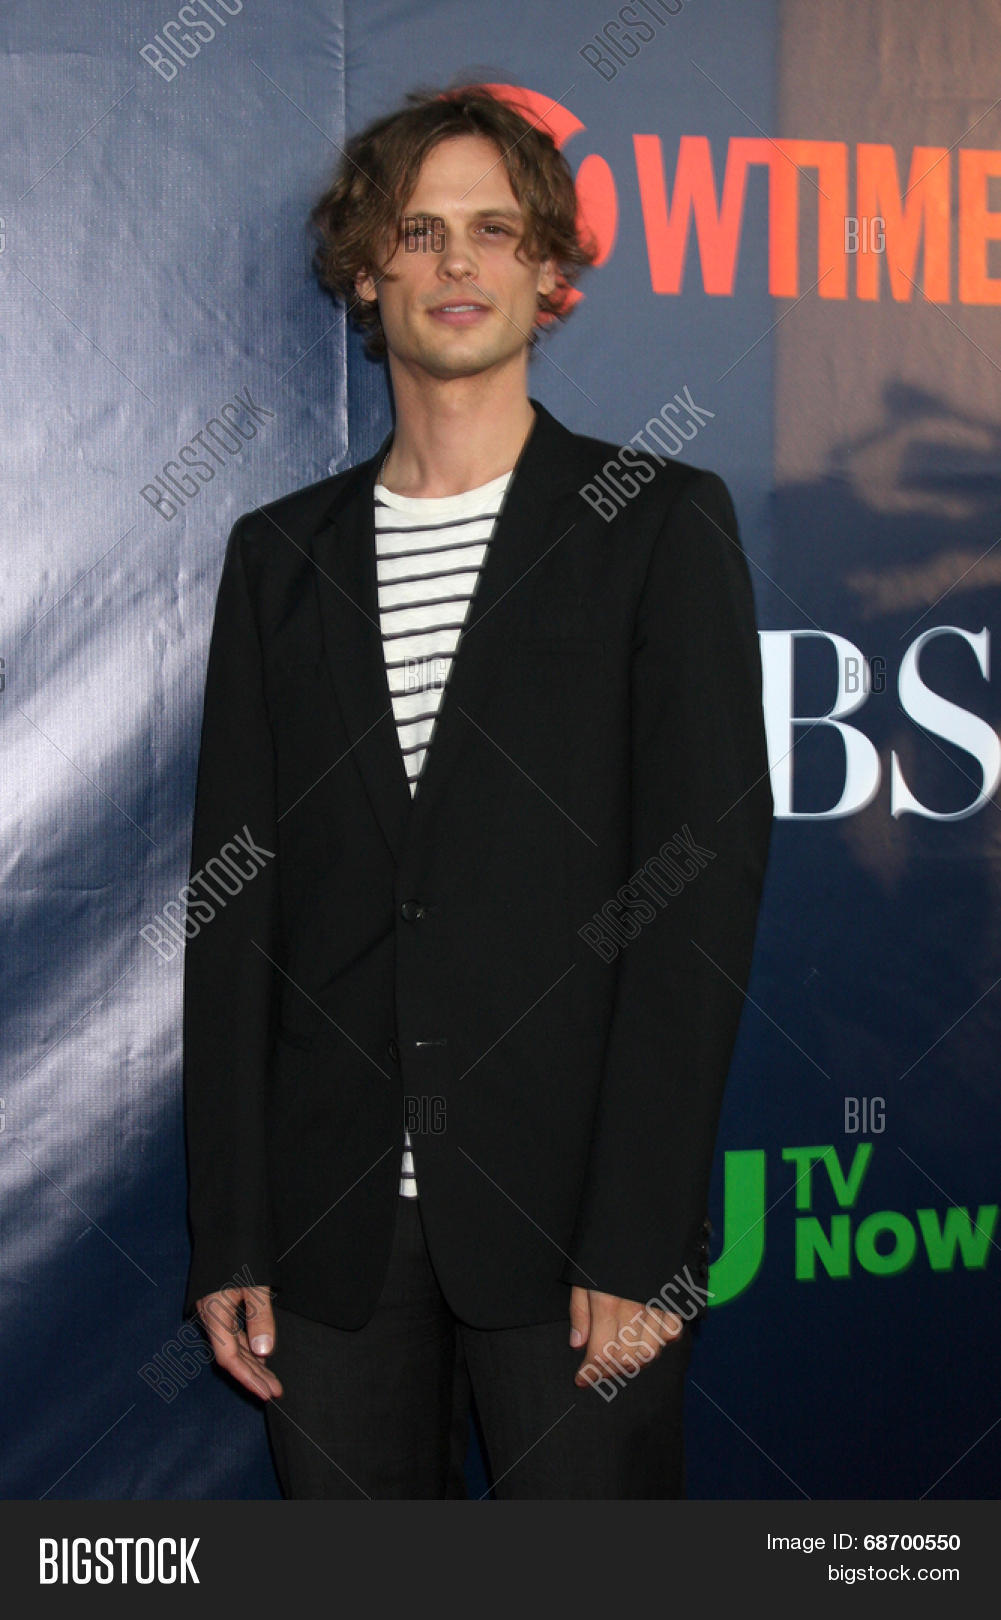 Style Crush: Matthew Gray Gubler - Fashion Grunge 99